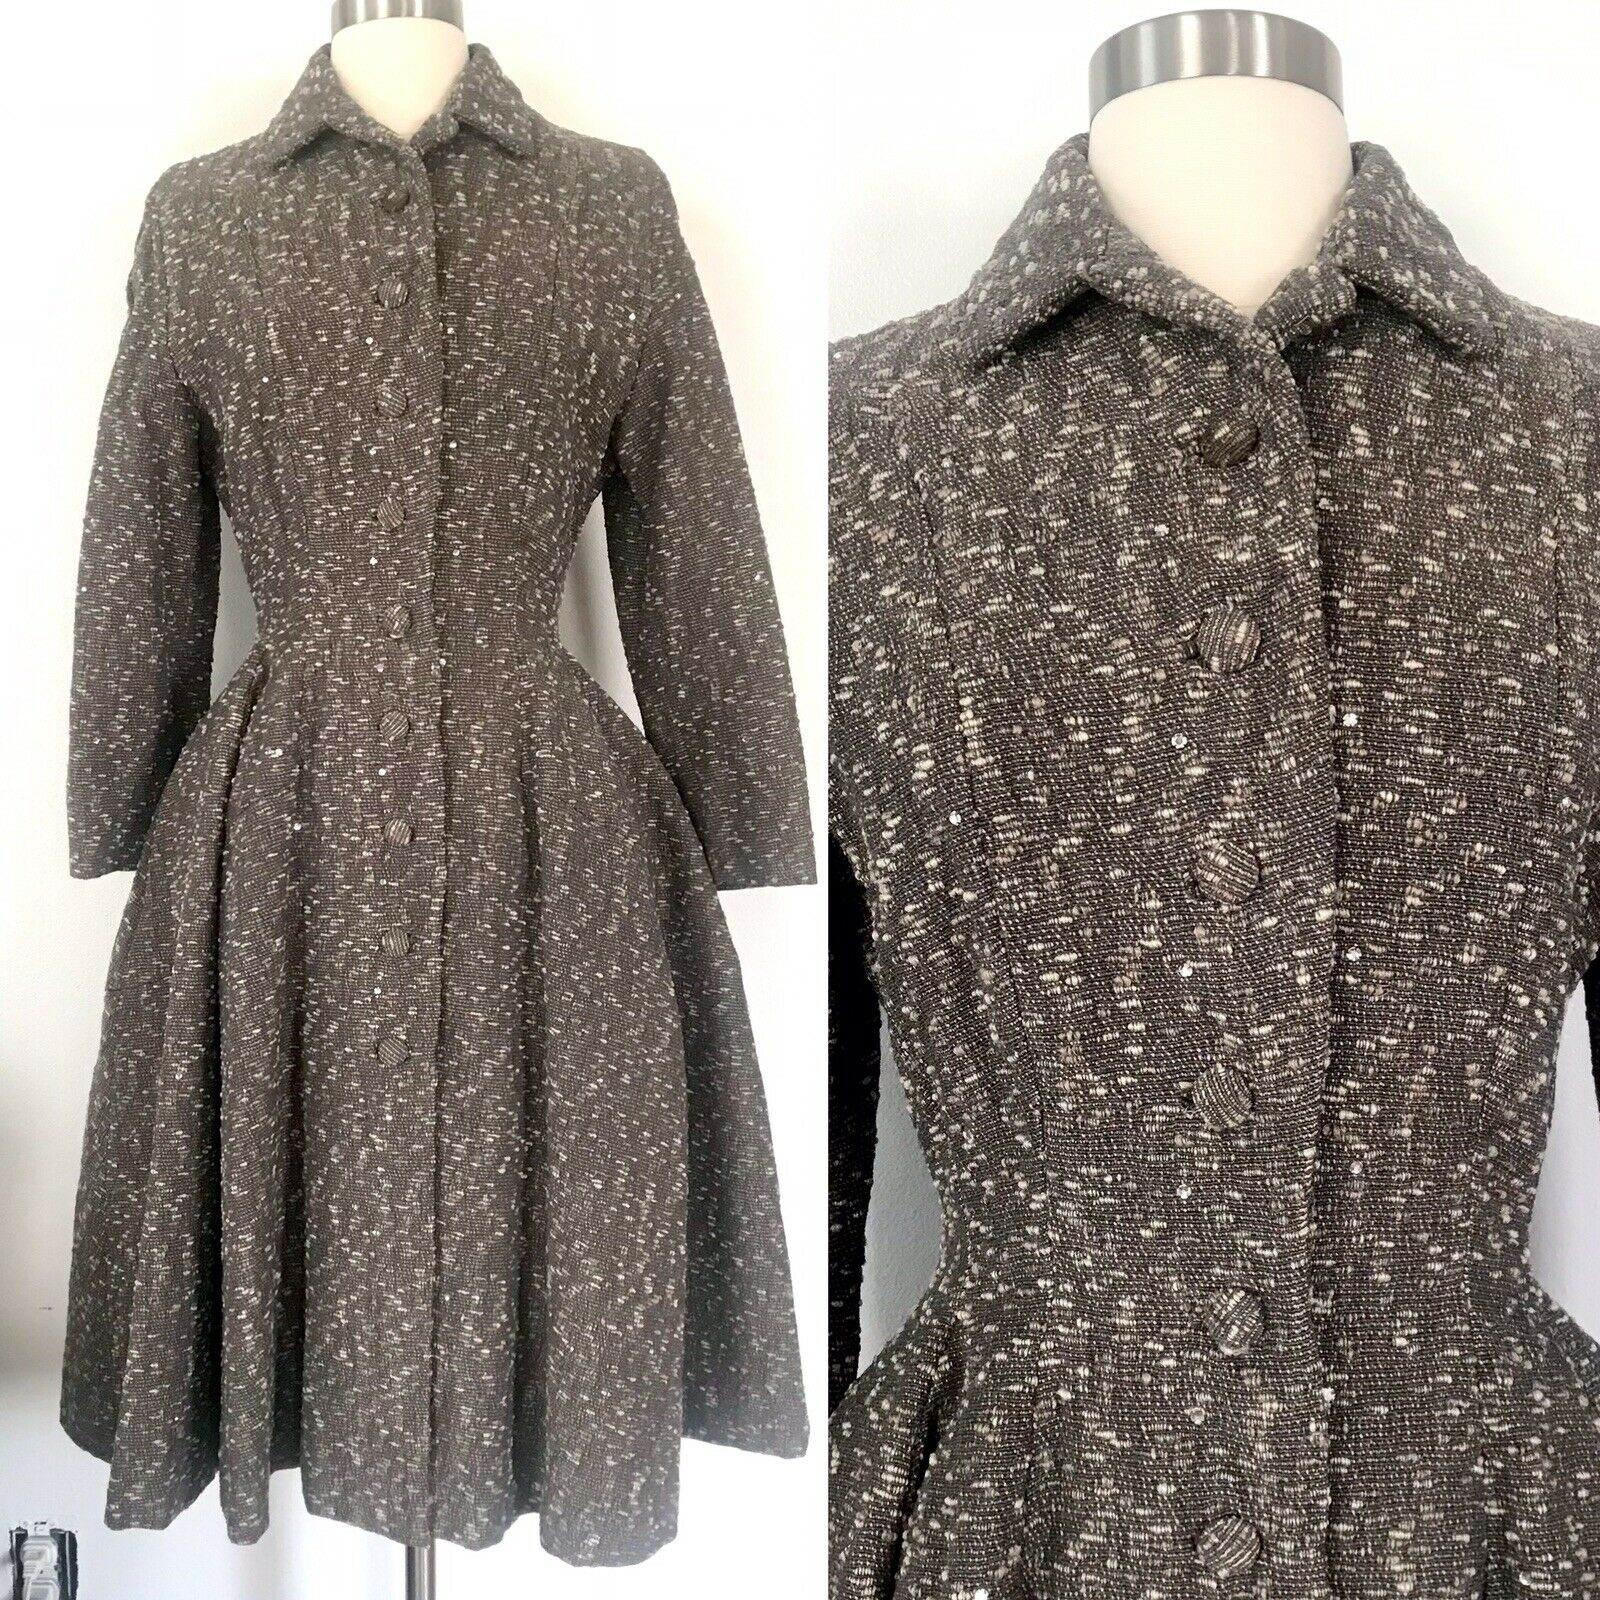 Vintage 1950's Lilli Ann Princess Coat Fit & Flar… - image 1